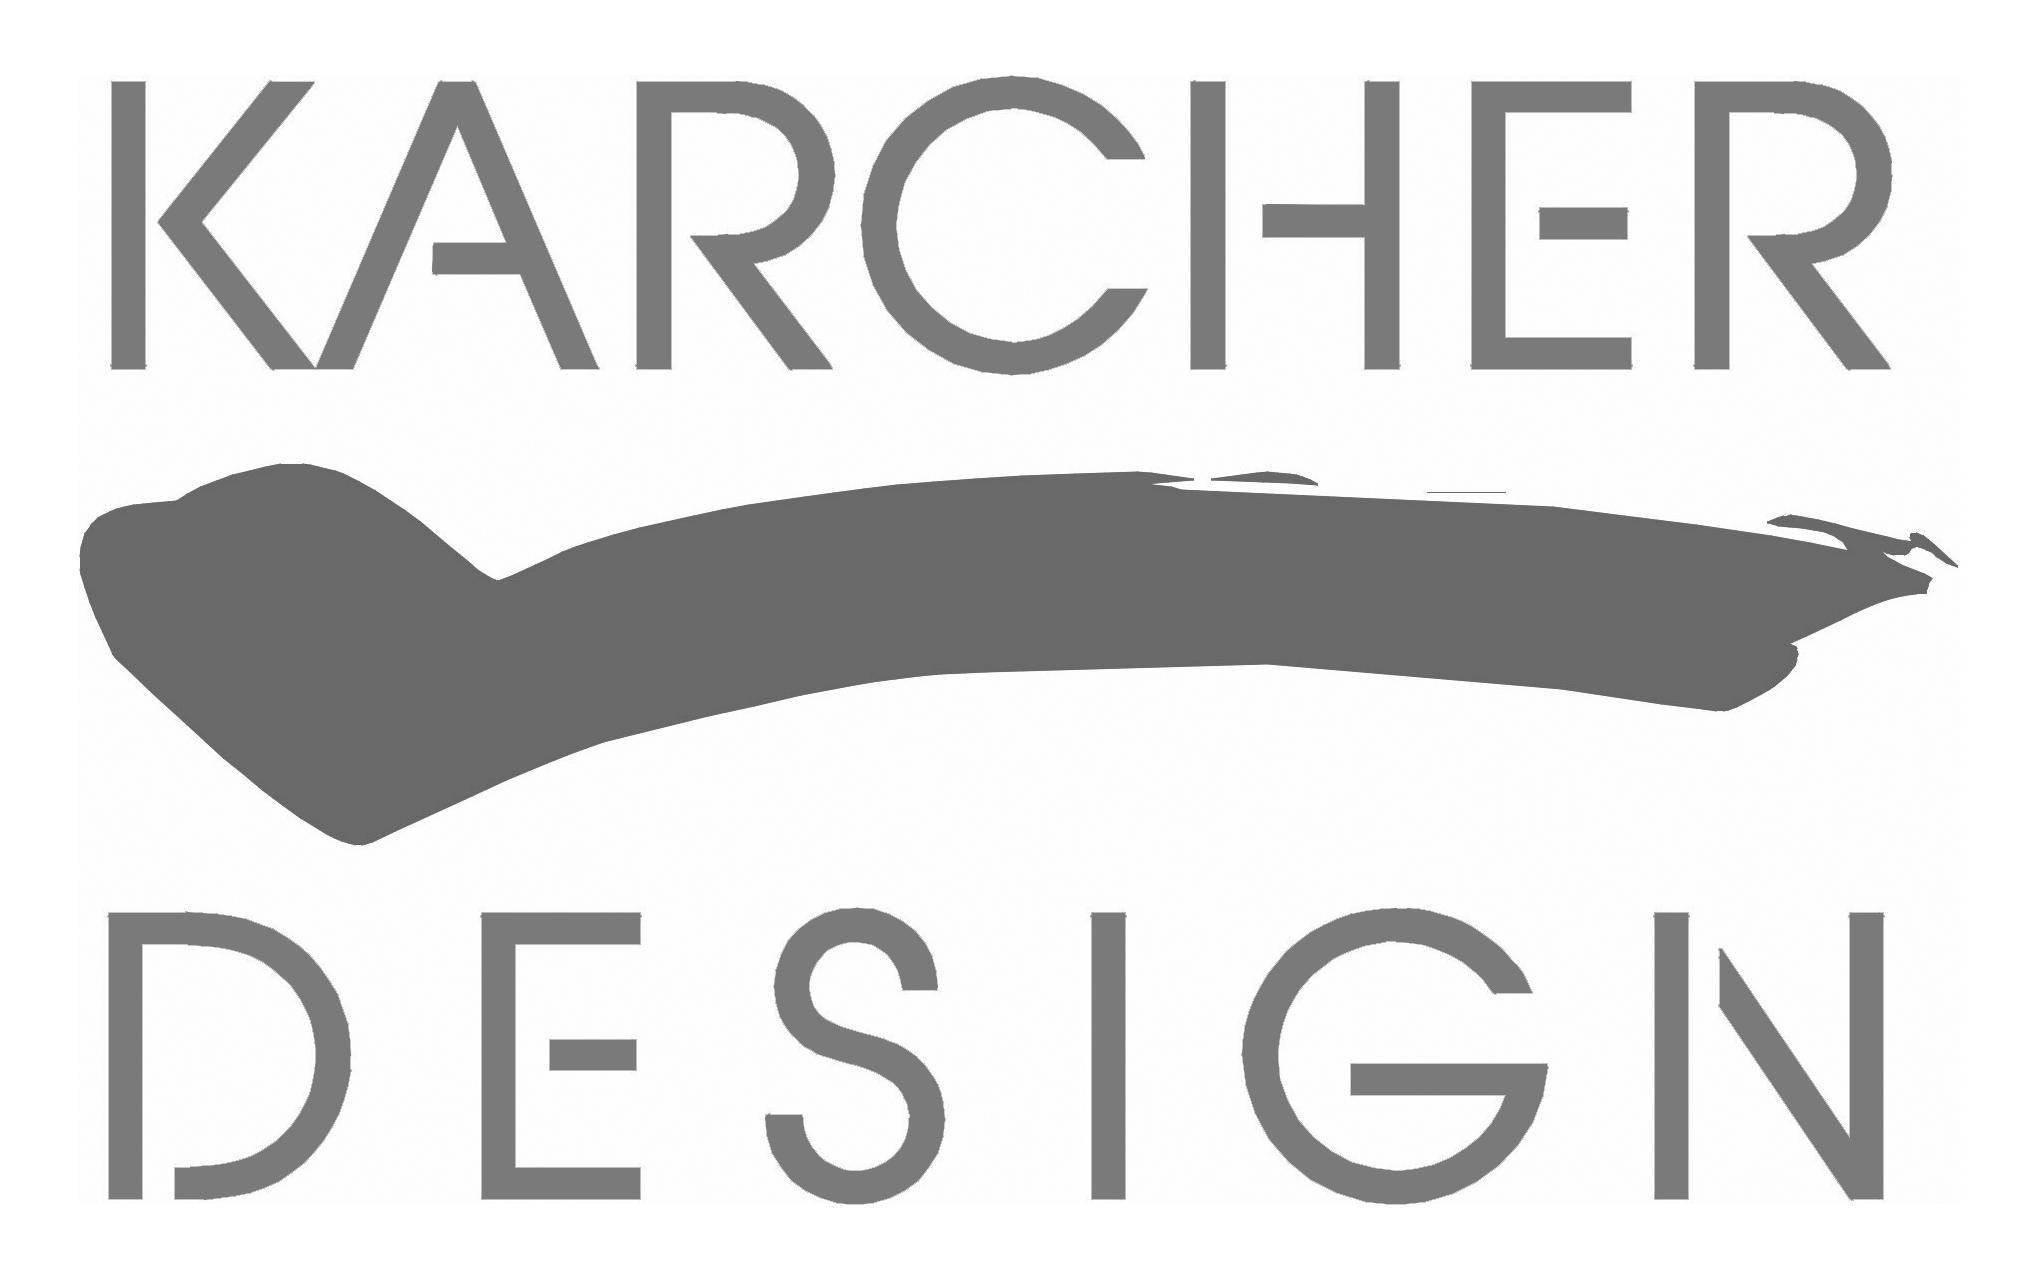 Karcher Design Products